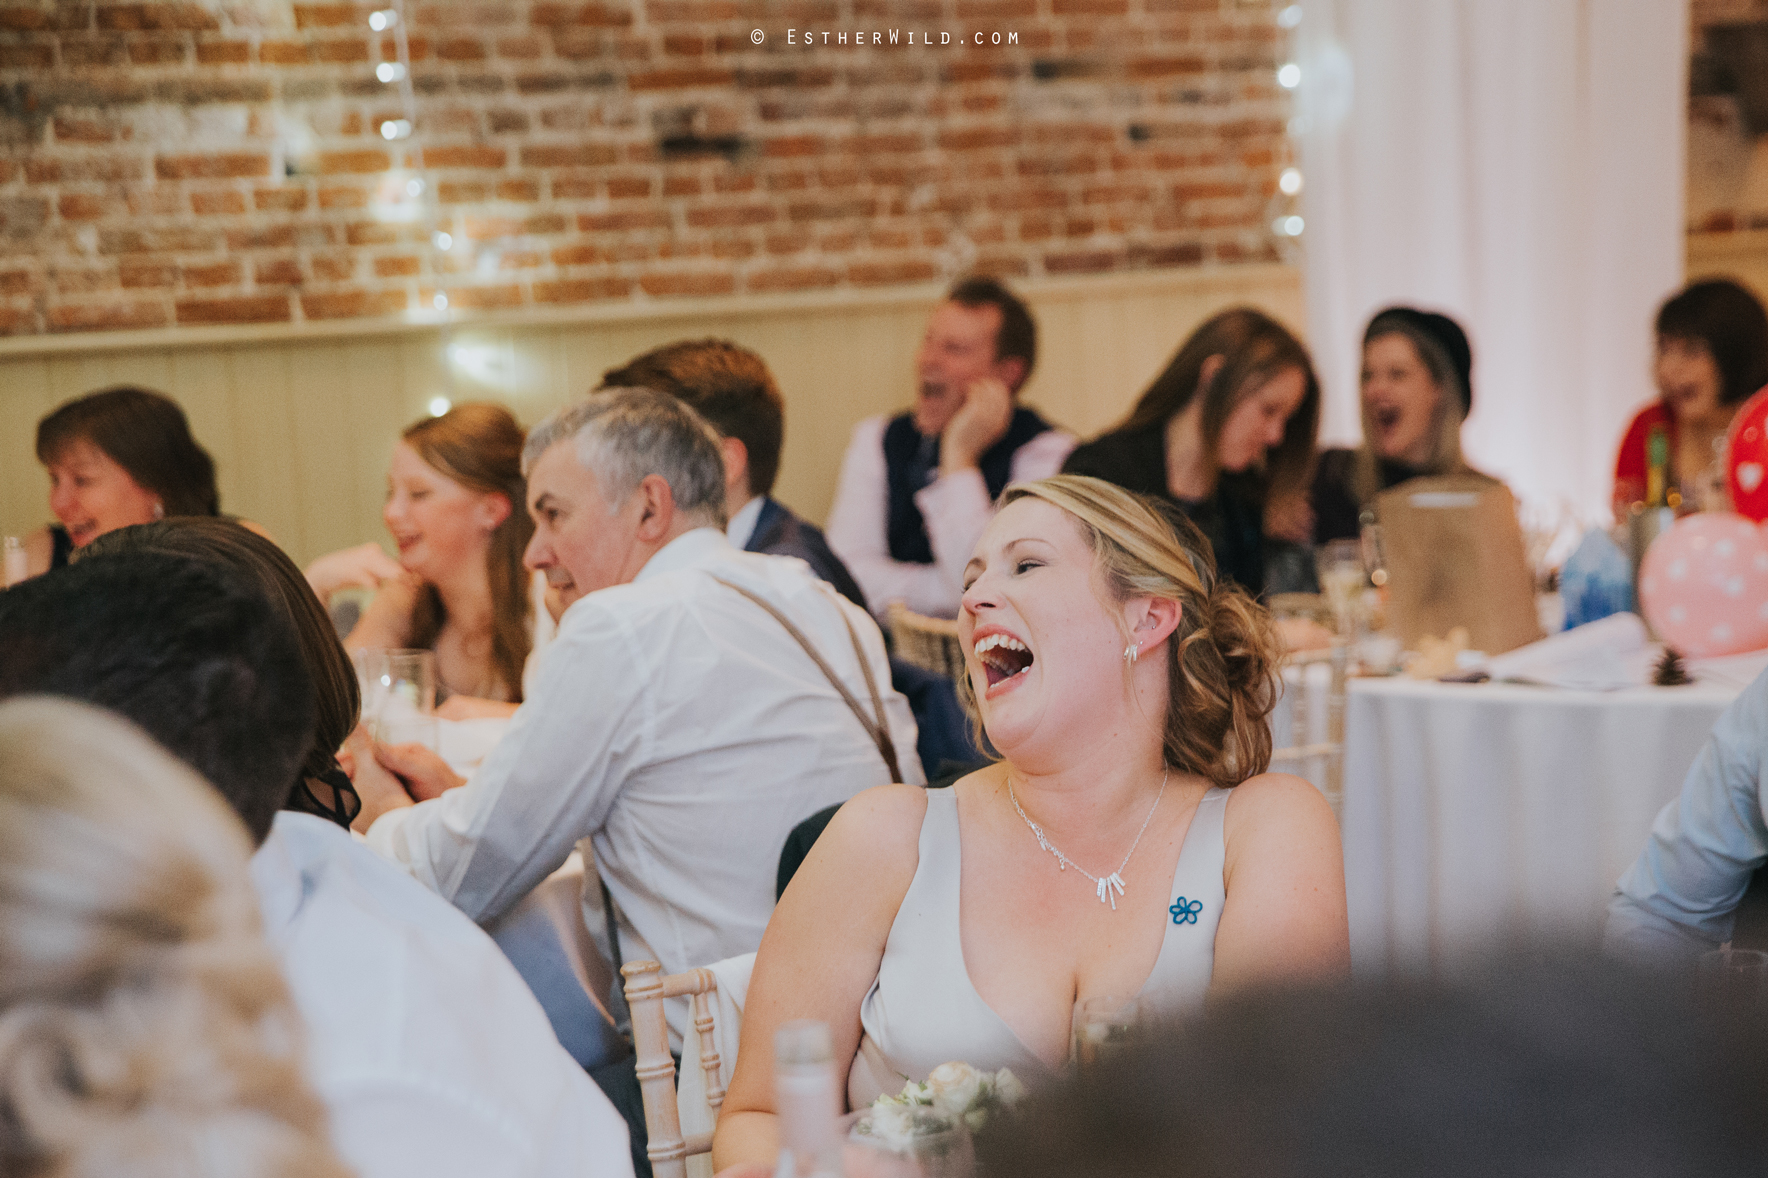 Elms_Barn_Weddings_Suffolk_Photographer_Copyright_Esther_Wild_IMG_2873.jpg